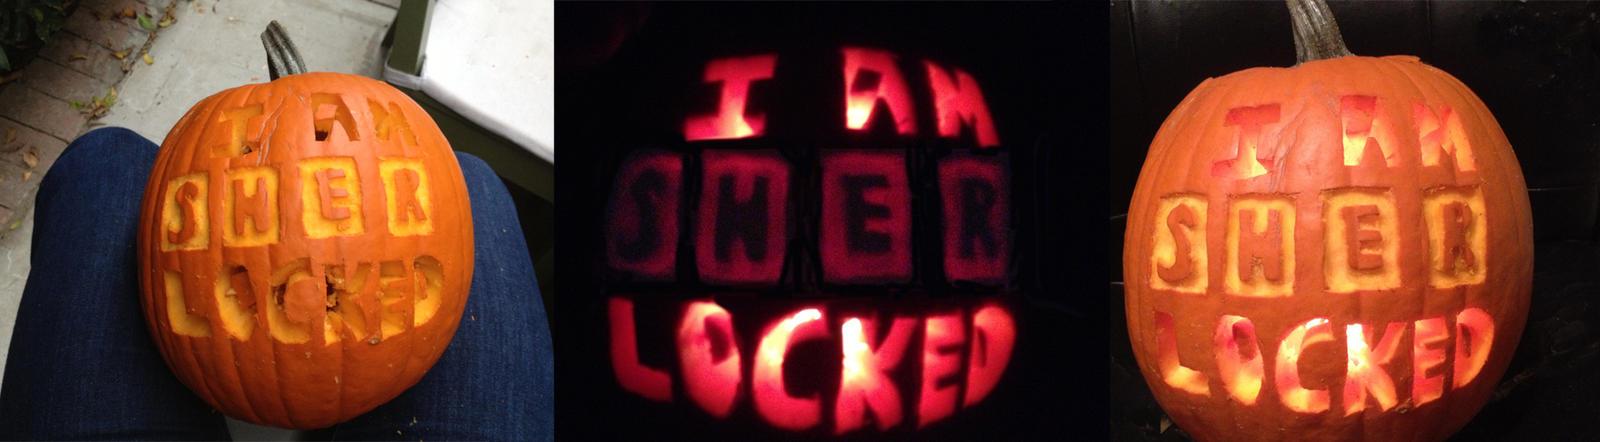 Sherlock Pumpkin by LaurenKitsune